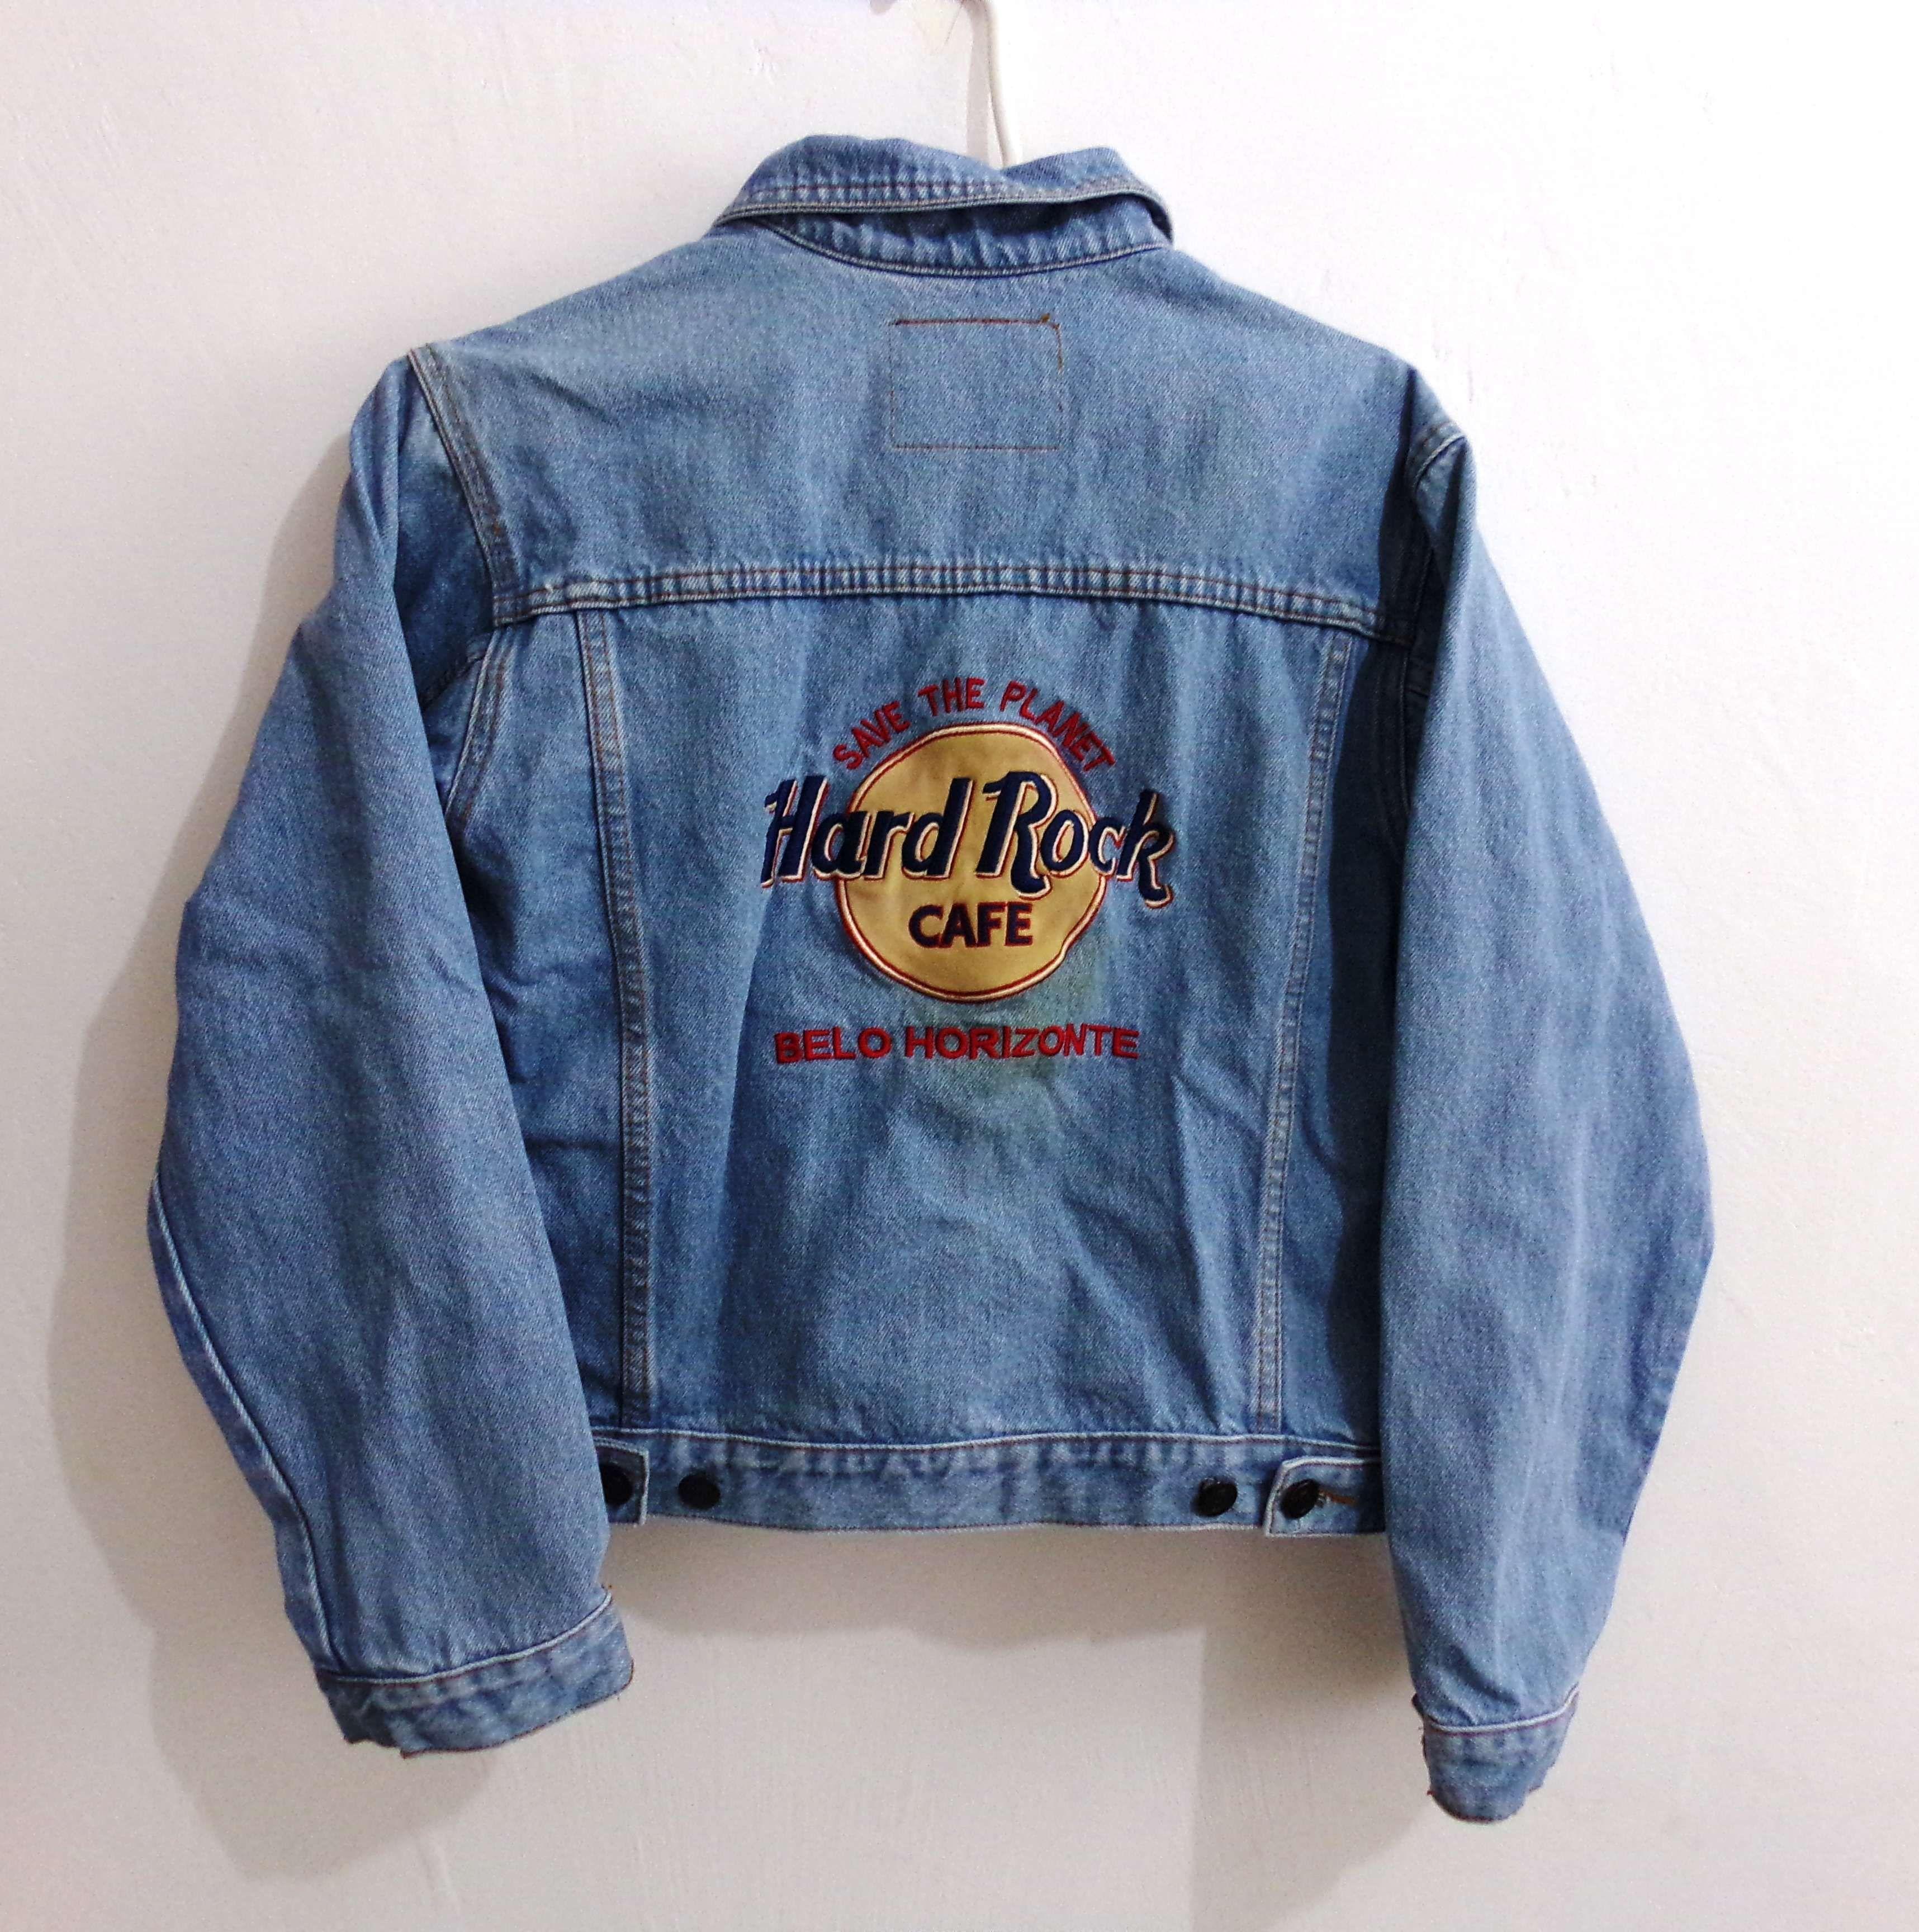 be9d6aaf3a Jaqueta Hard Rock Café | Ideas | Jaqueta vintage, Jeans vintage e ...